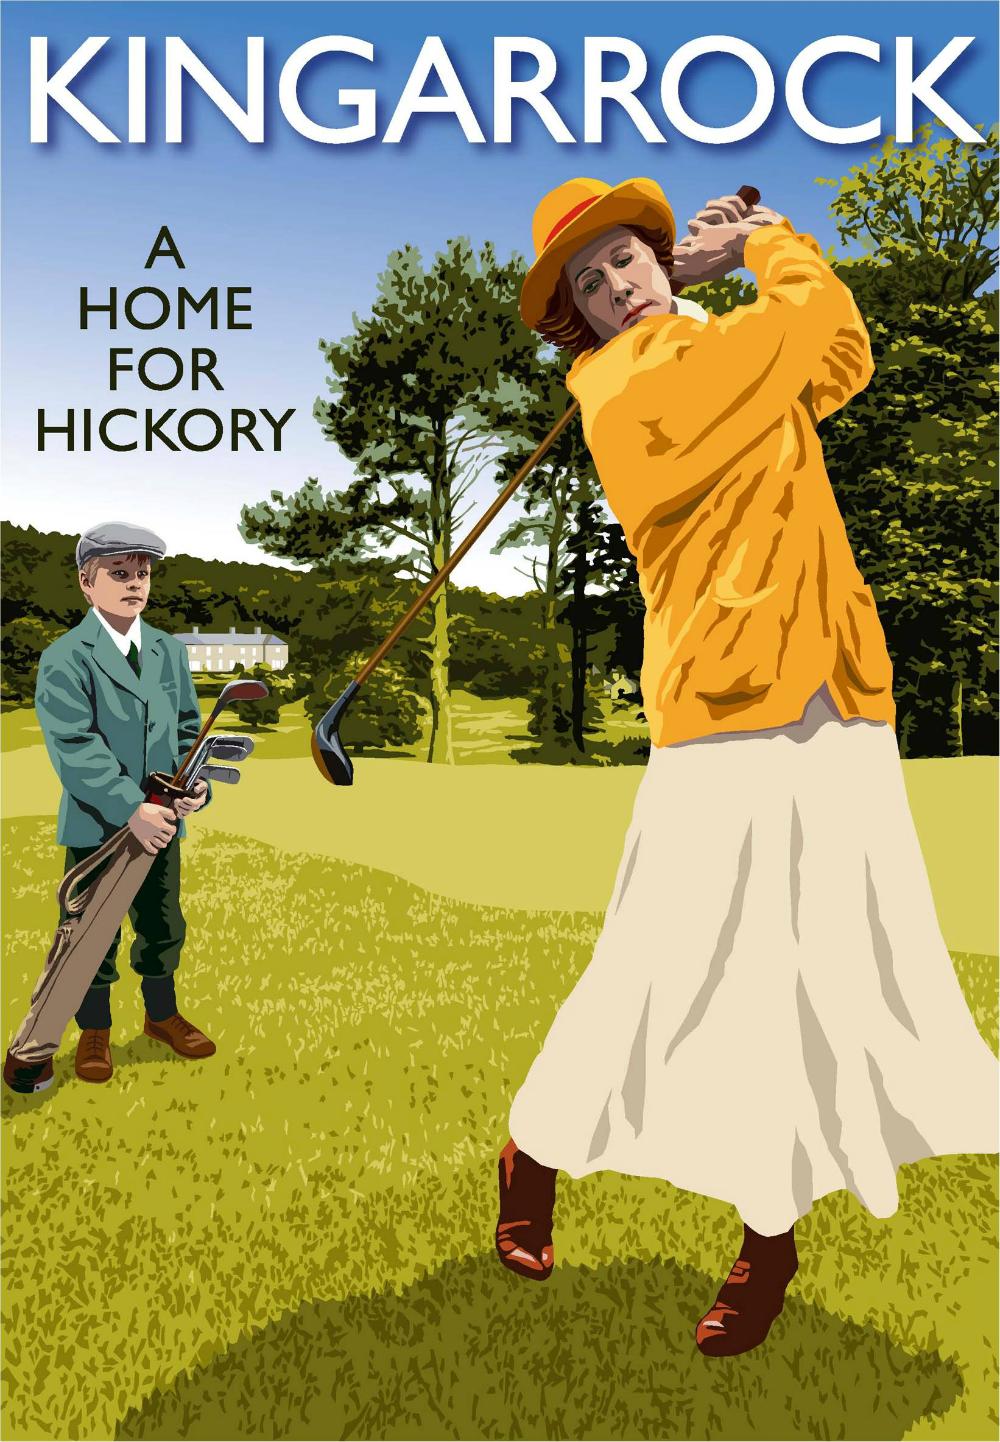 Affiche de Kingarrock